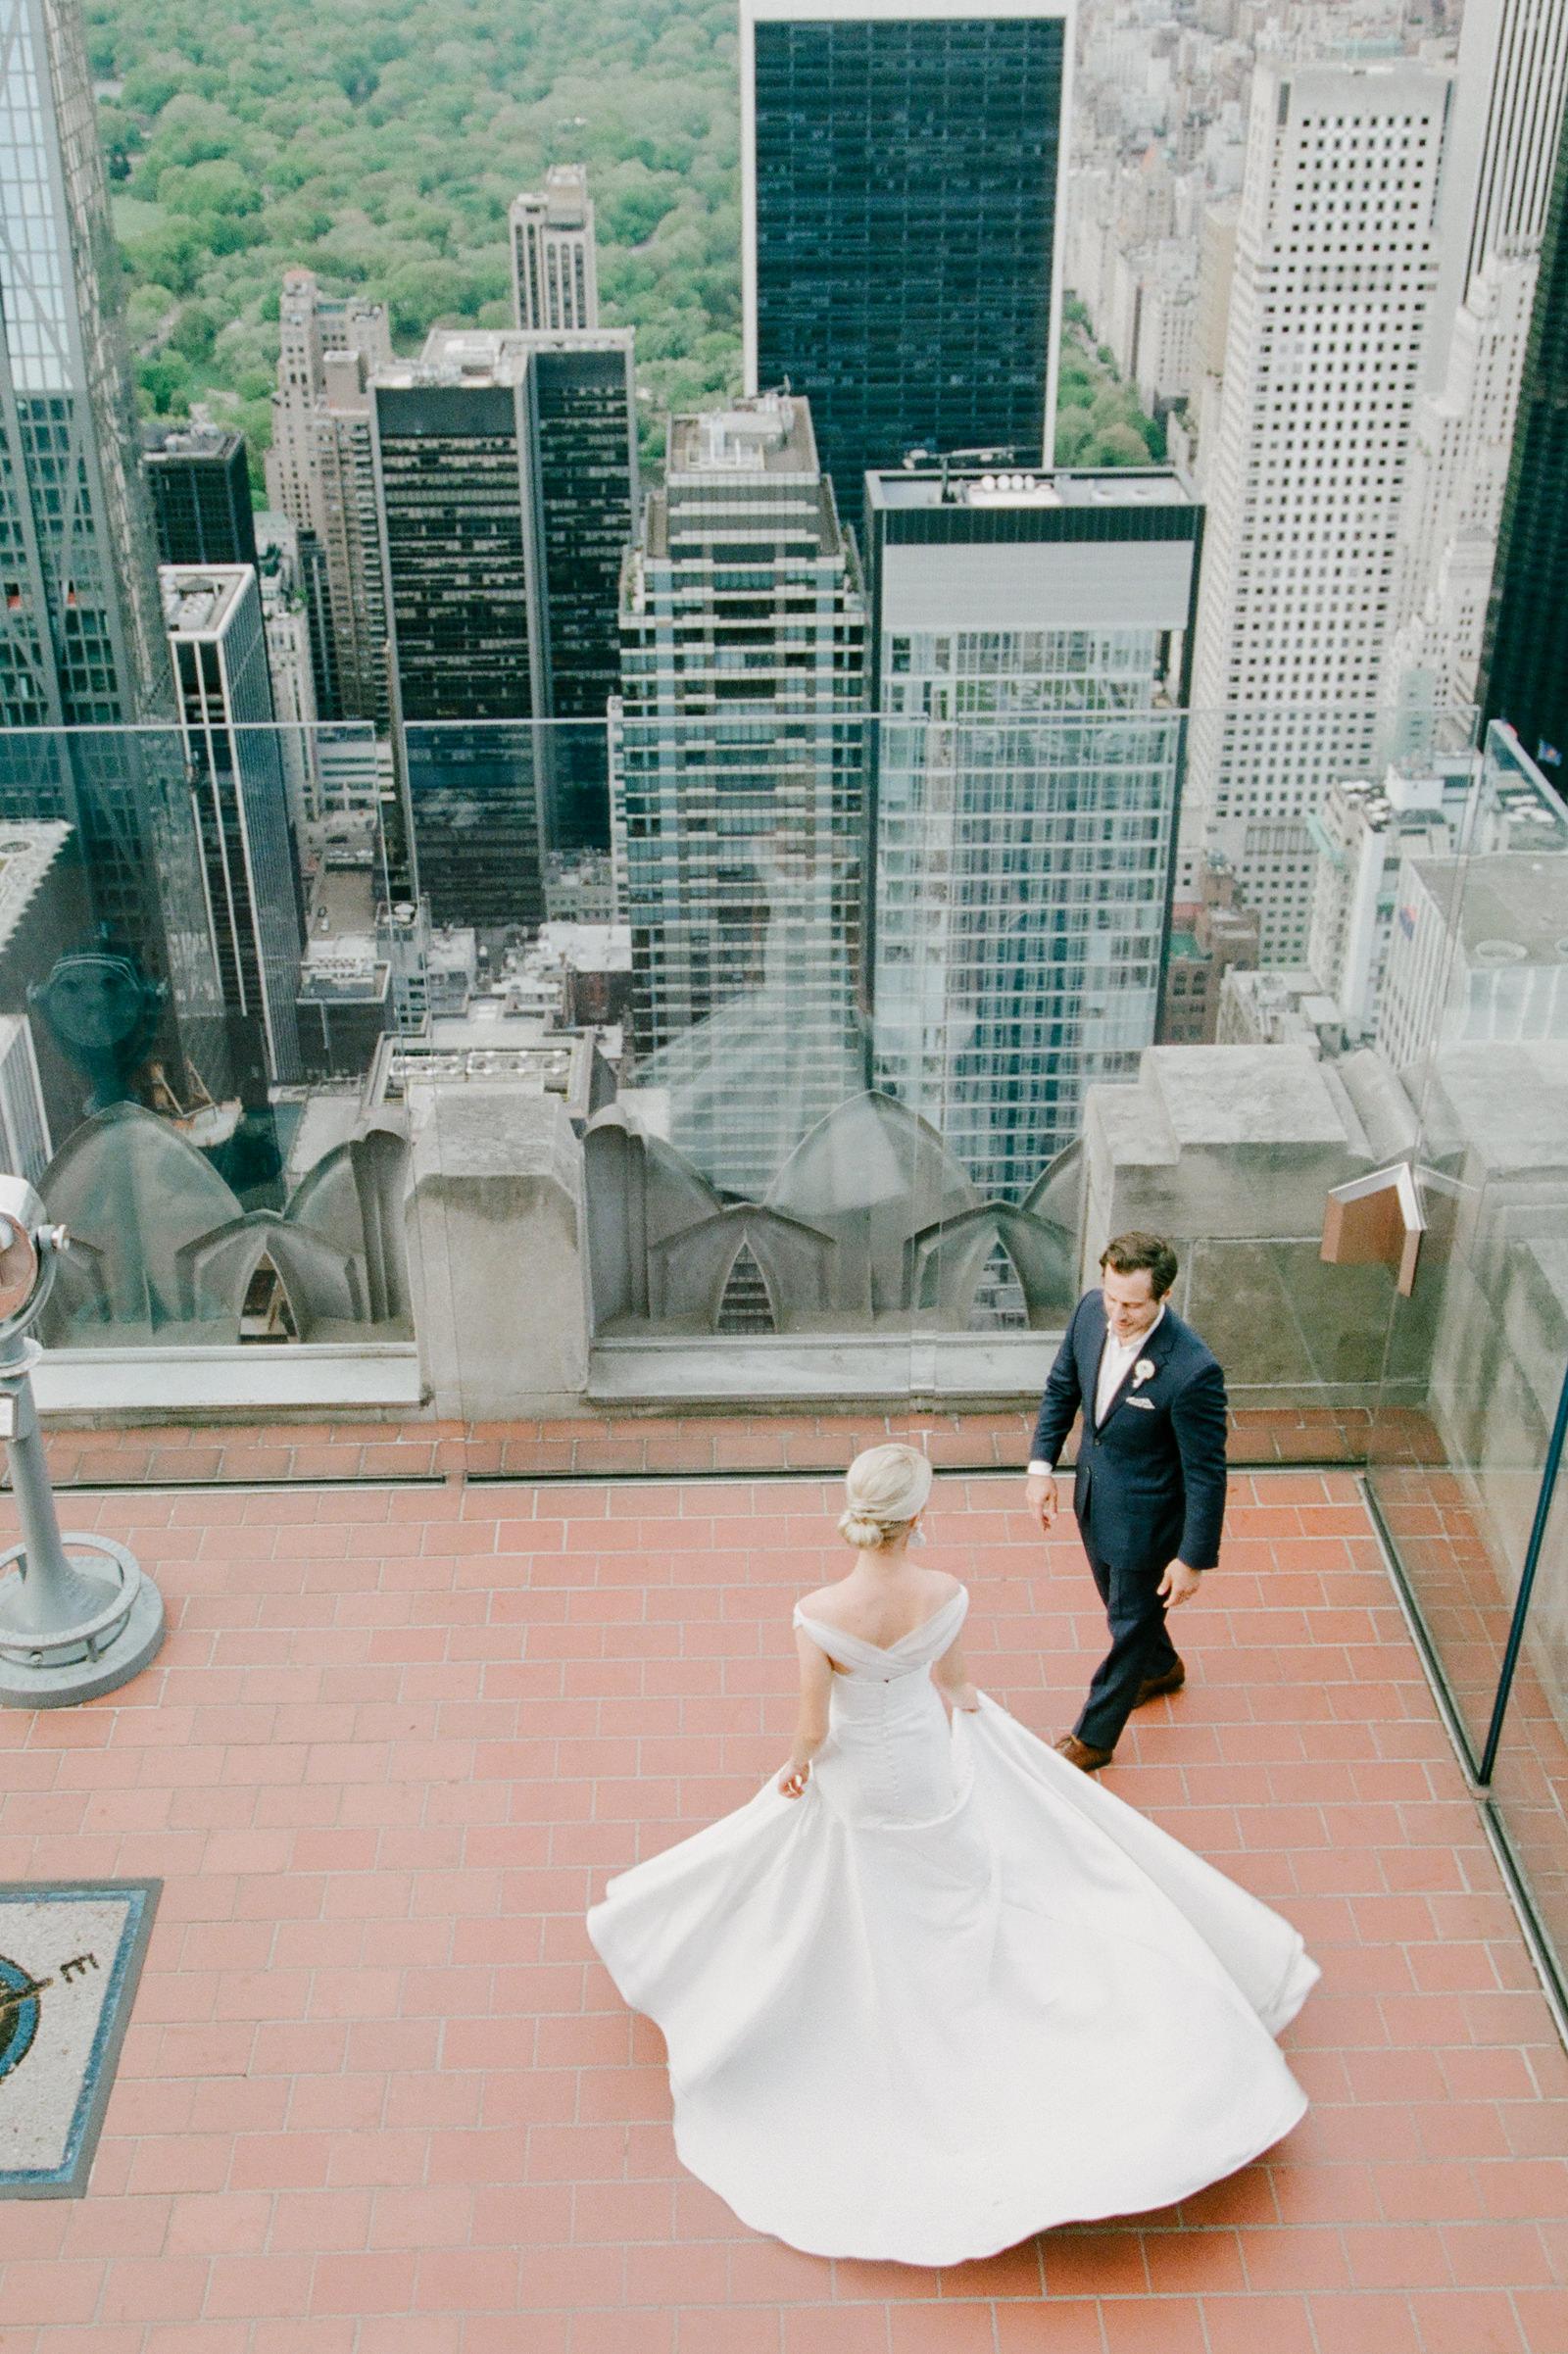 Intimate-NYC_wedding_ by Tanya Isaeva-175.jpg